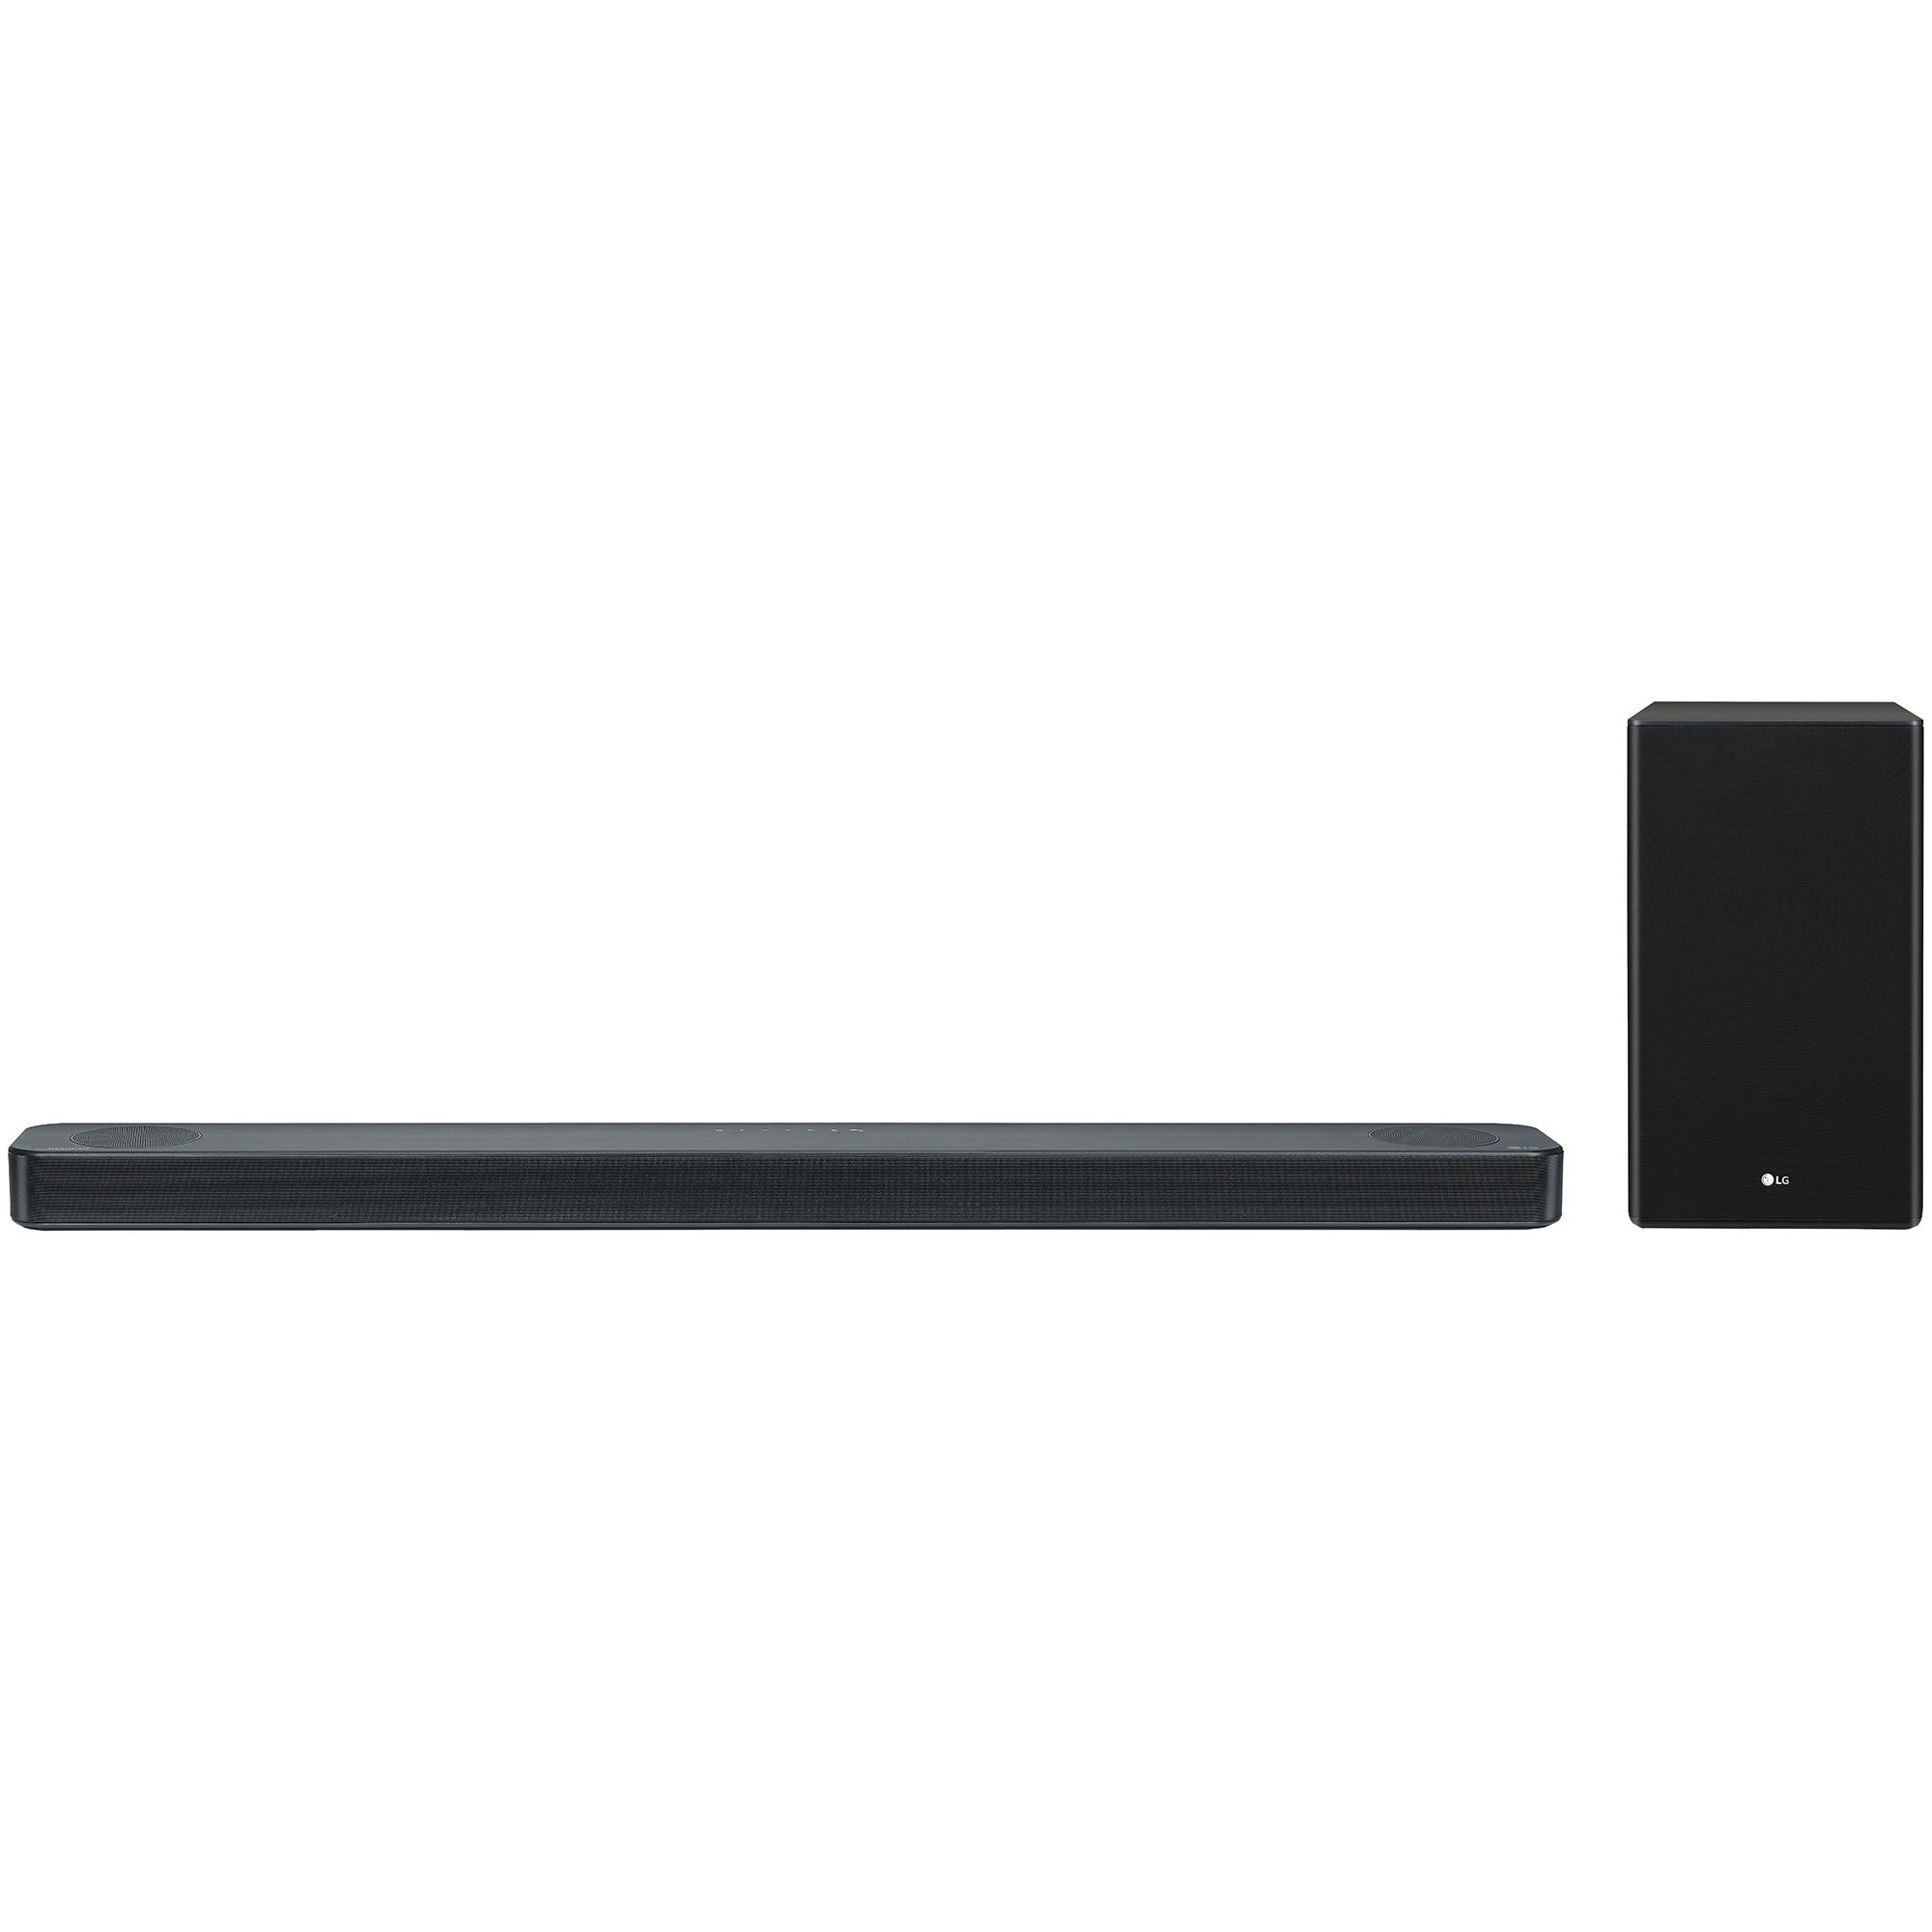 Fotografie Soundbar LG SL8Y, 440W, 3.1.2 , High Res Audio ,Meridian Technology, Dolby Atmos & DTS:X, Wireless Rear Speaker-Ready